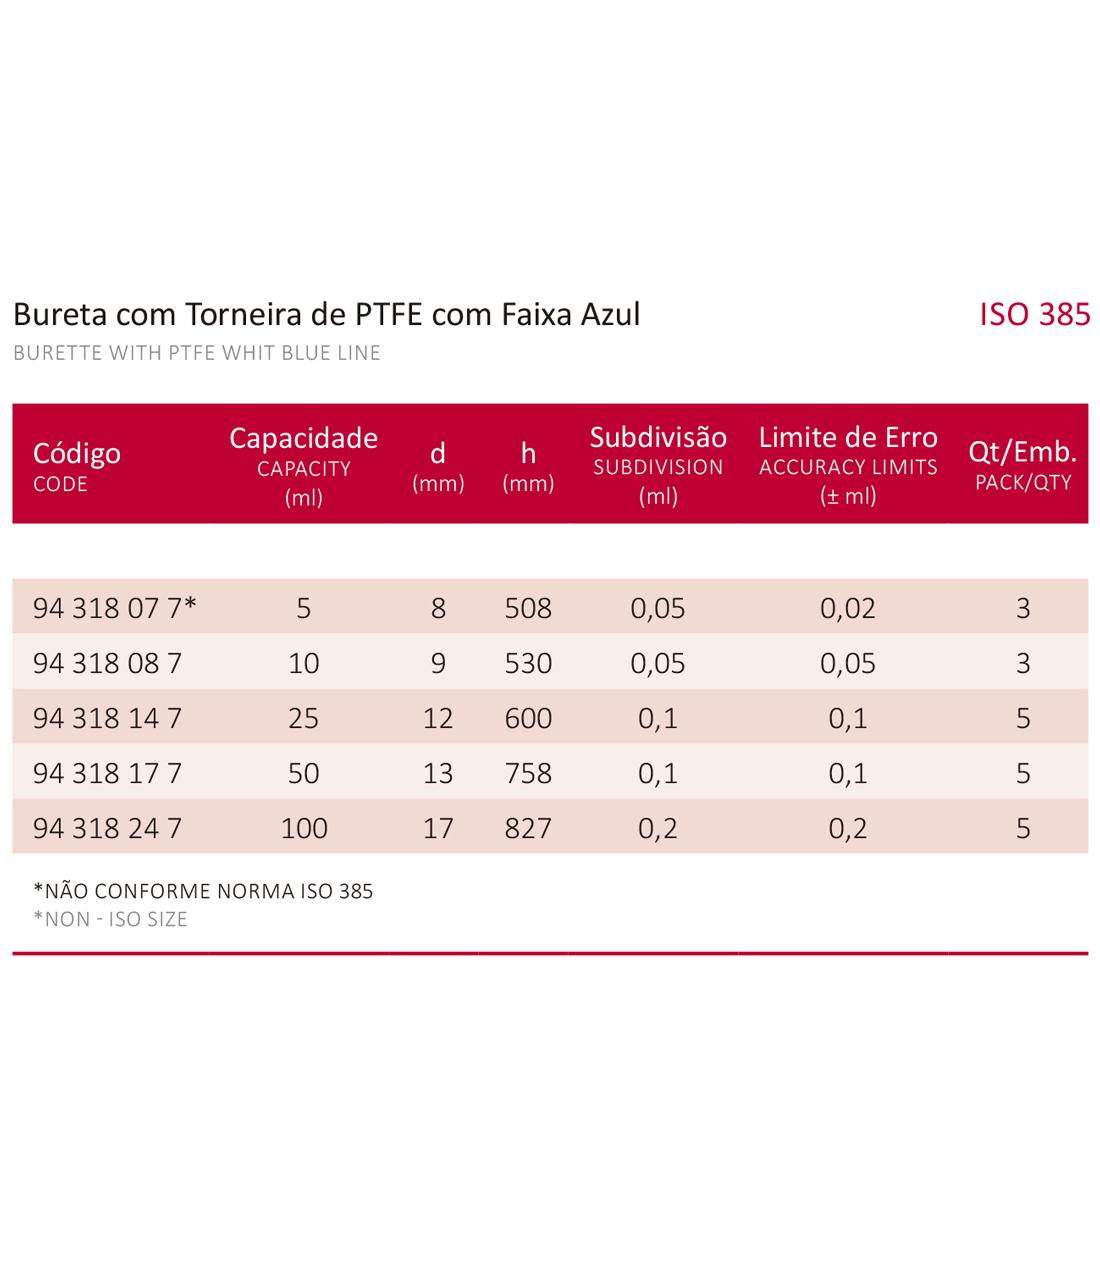 BURETA C/TORN. PTFE F/AZUL 100 ML - Laborglas - Cód. 94318247